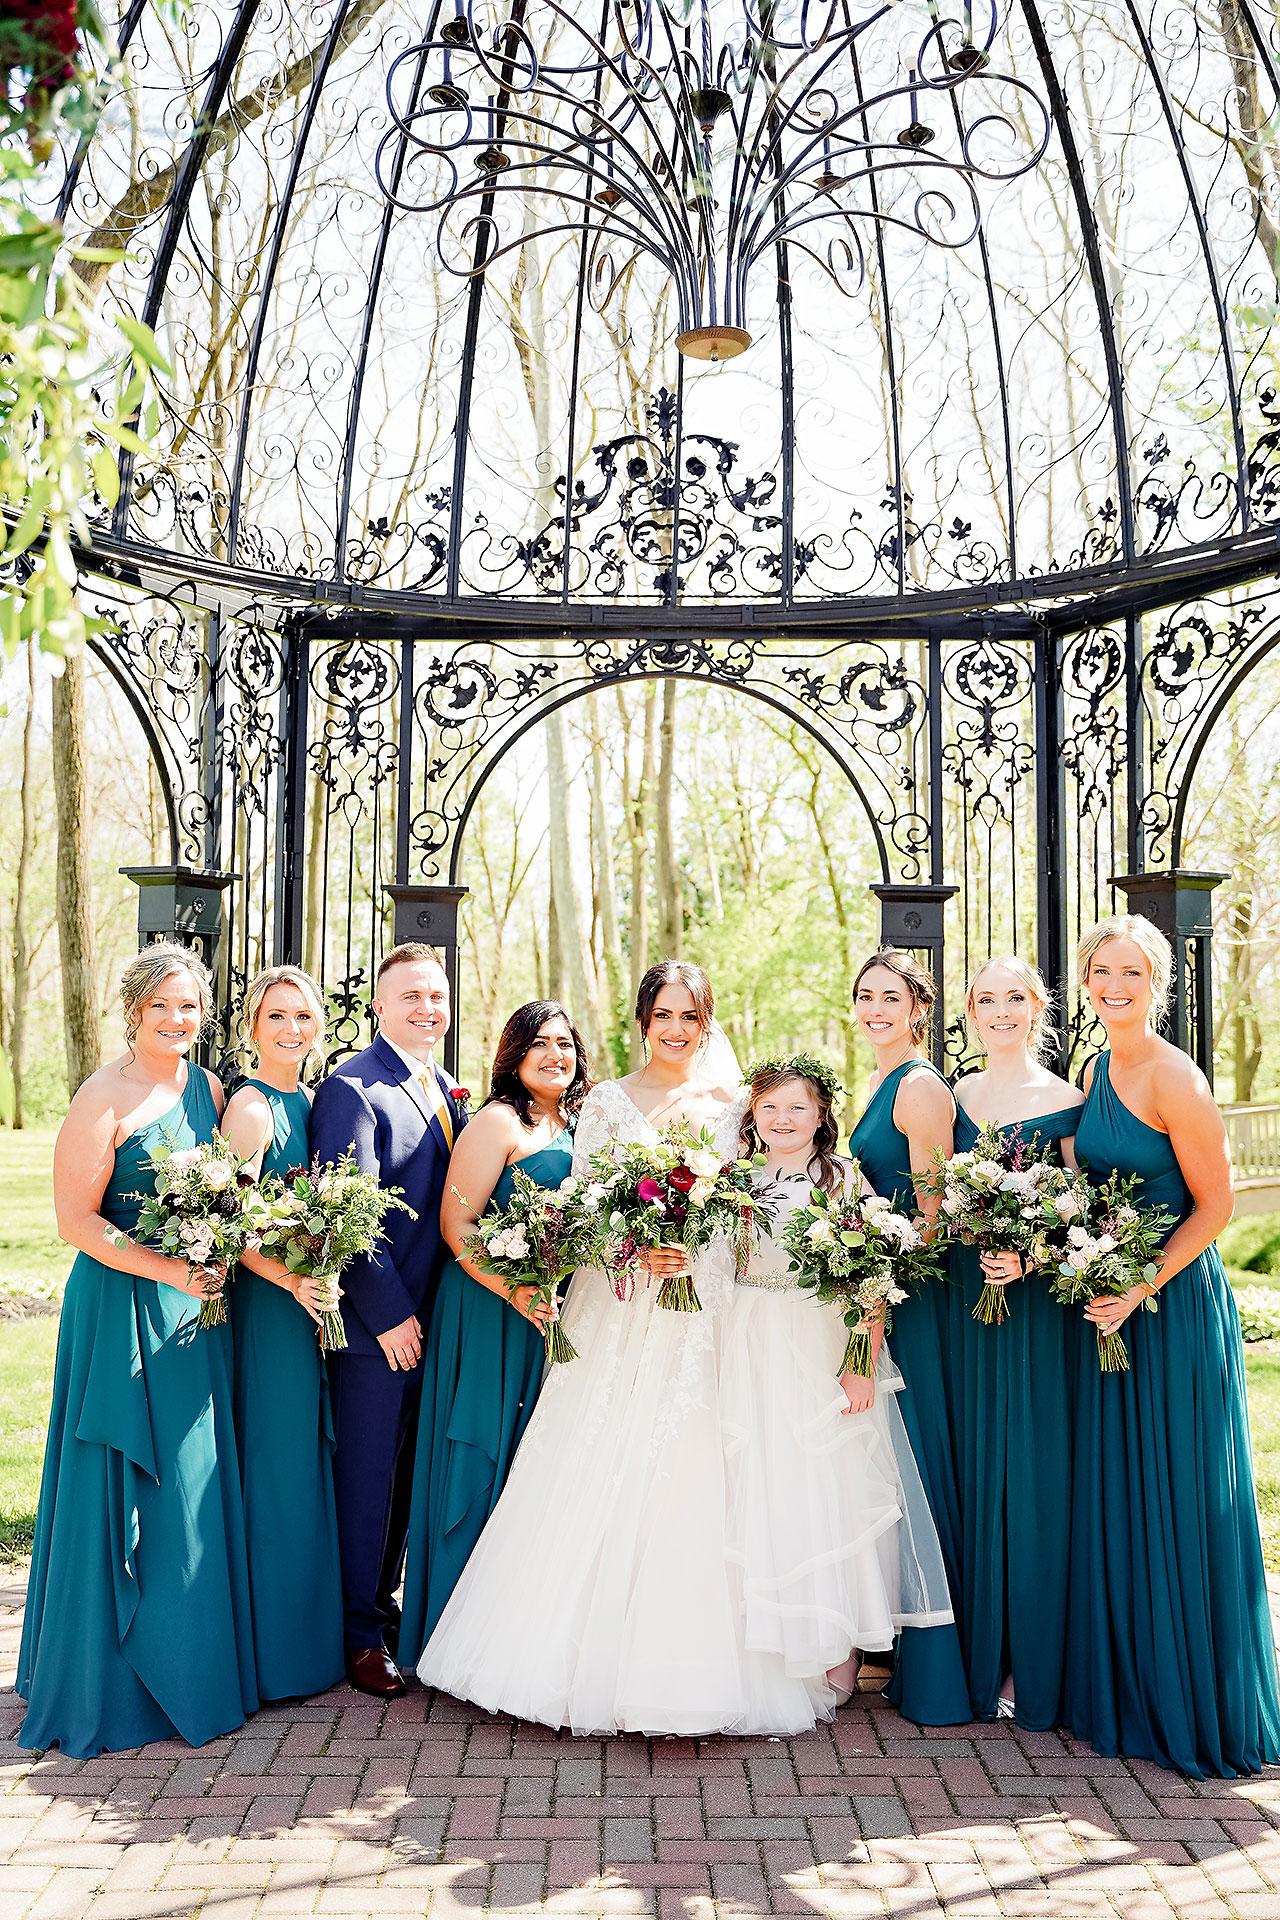 Nadia Parker Black Iris Estate Carmel Indiana Wedding May 2021 109